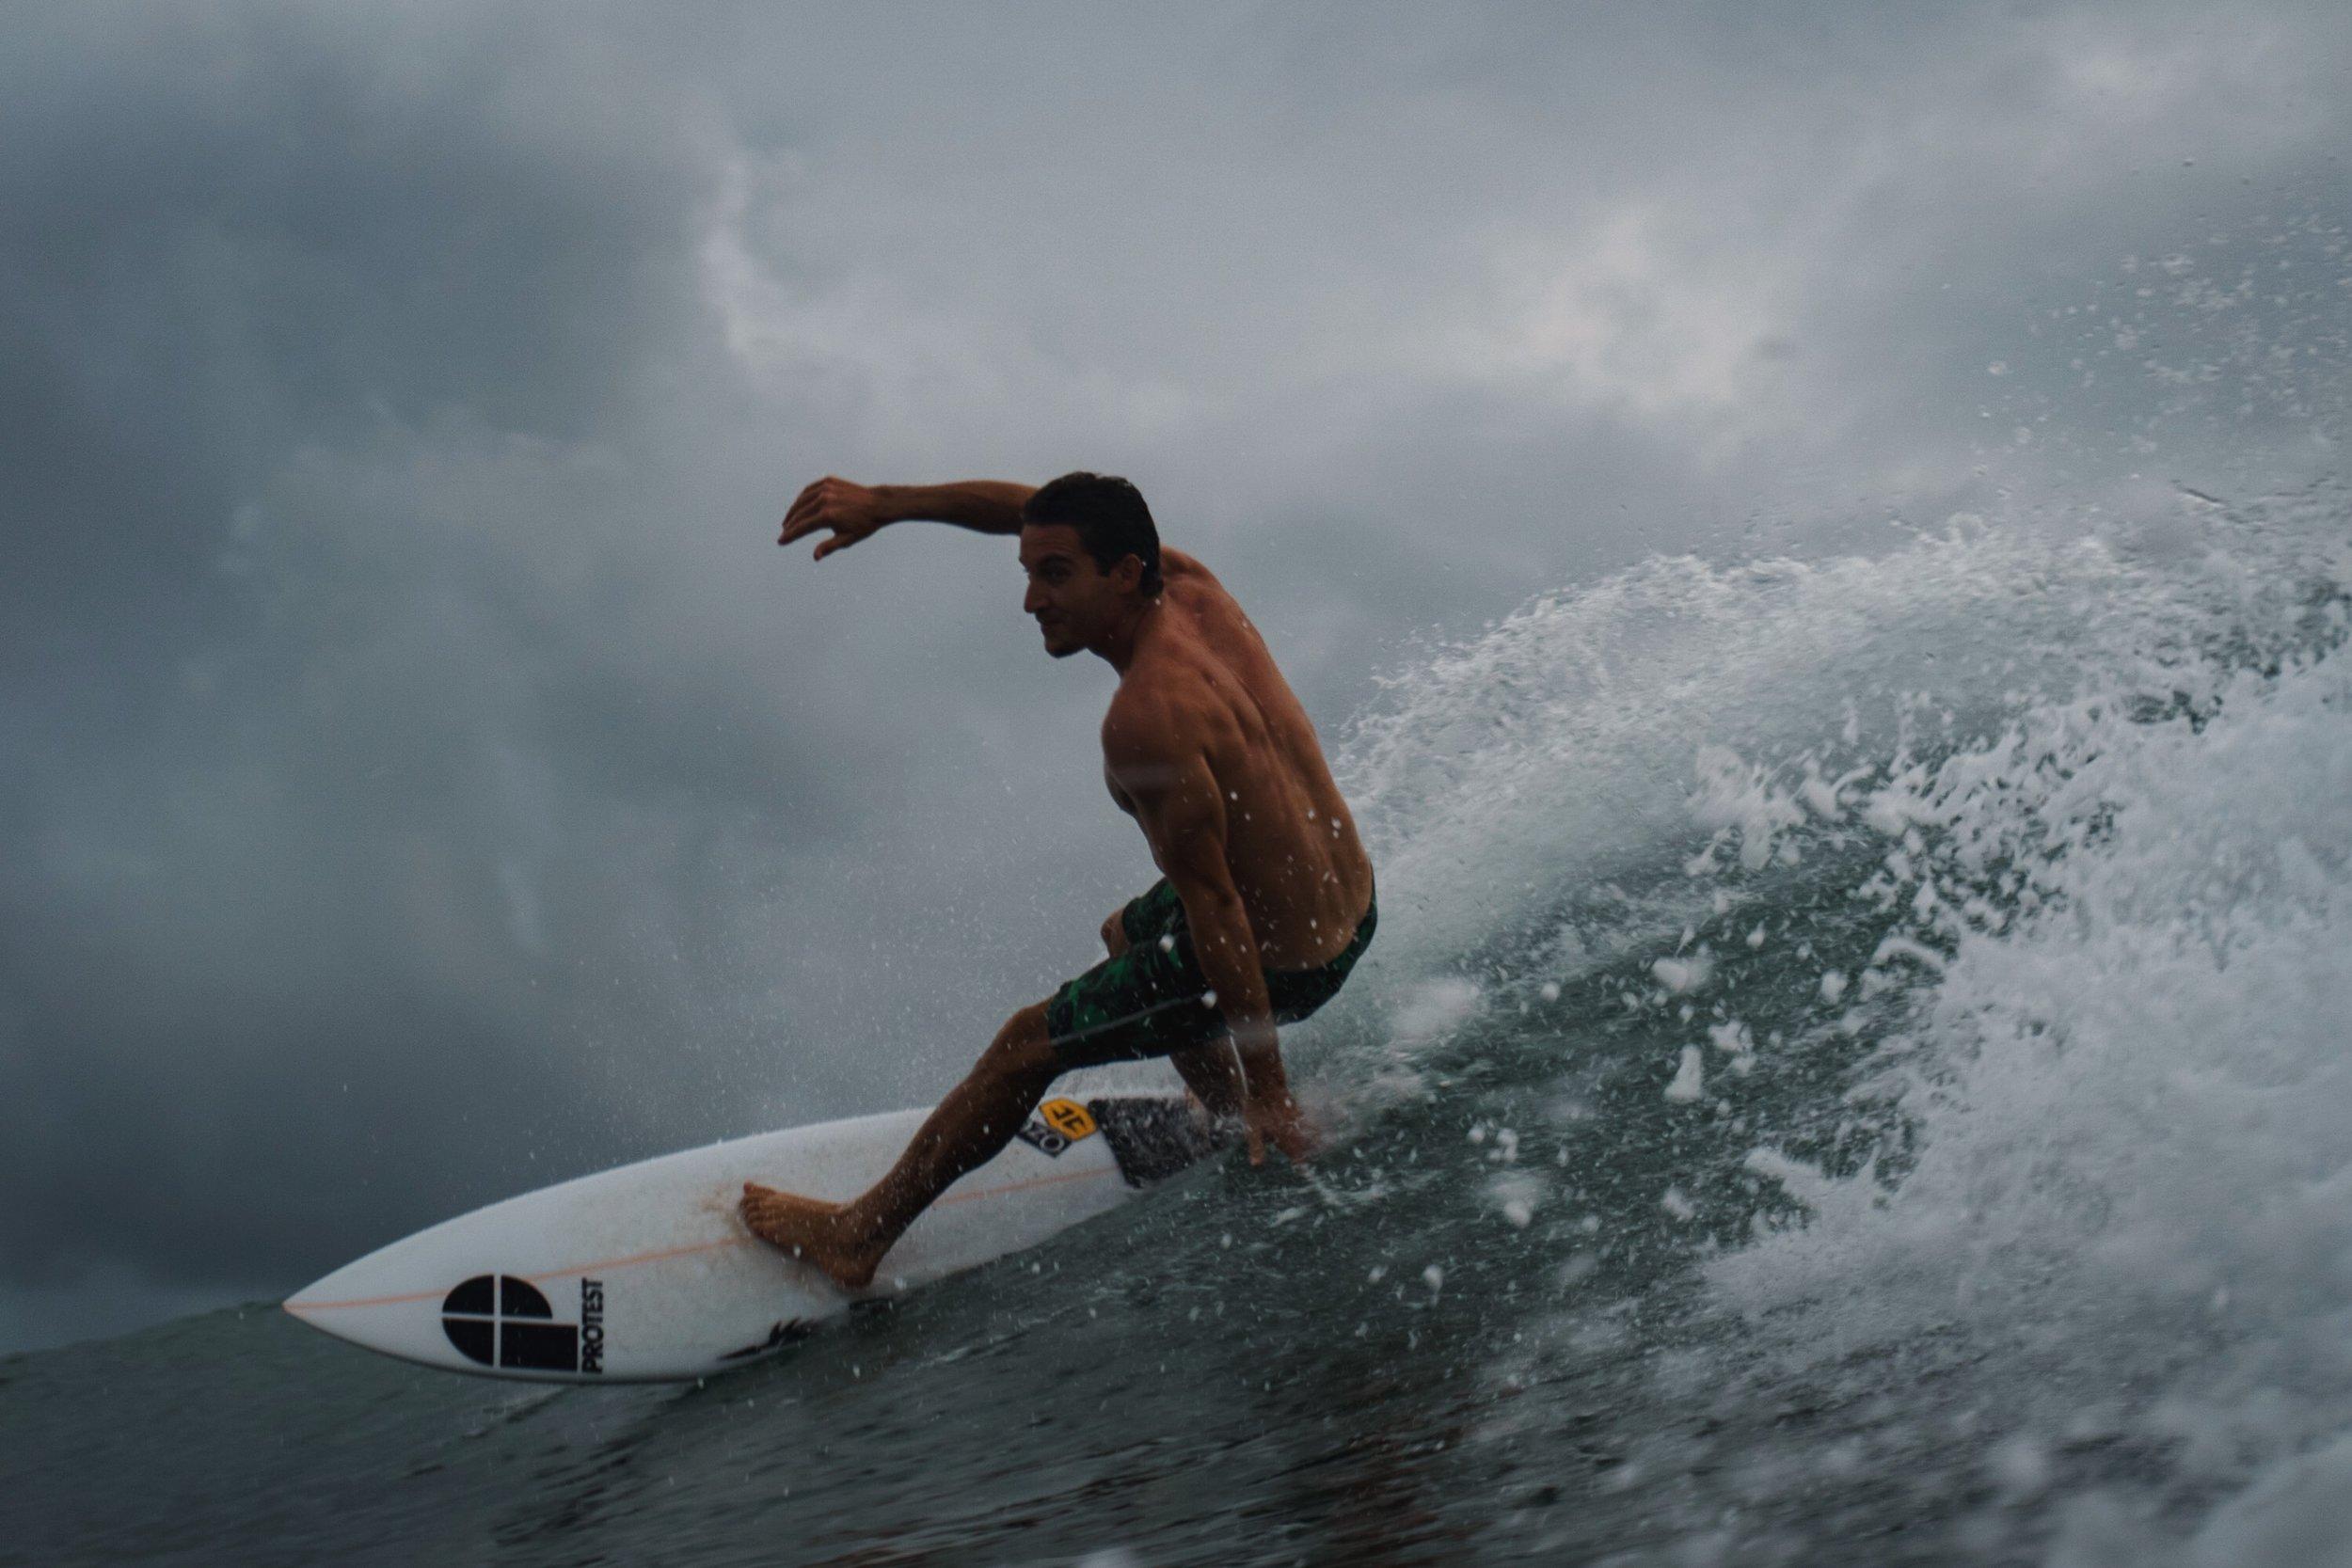 Tristan-Guibald-Surf-México-Sayulita-Pascuales-Zihuatanejo-Fotografía-Heiko-Bothe-2.JPG